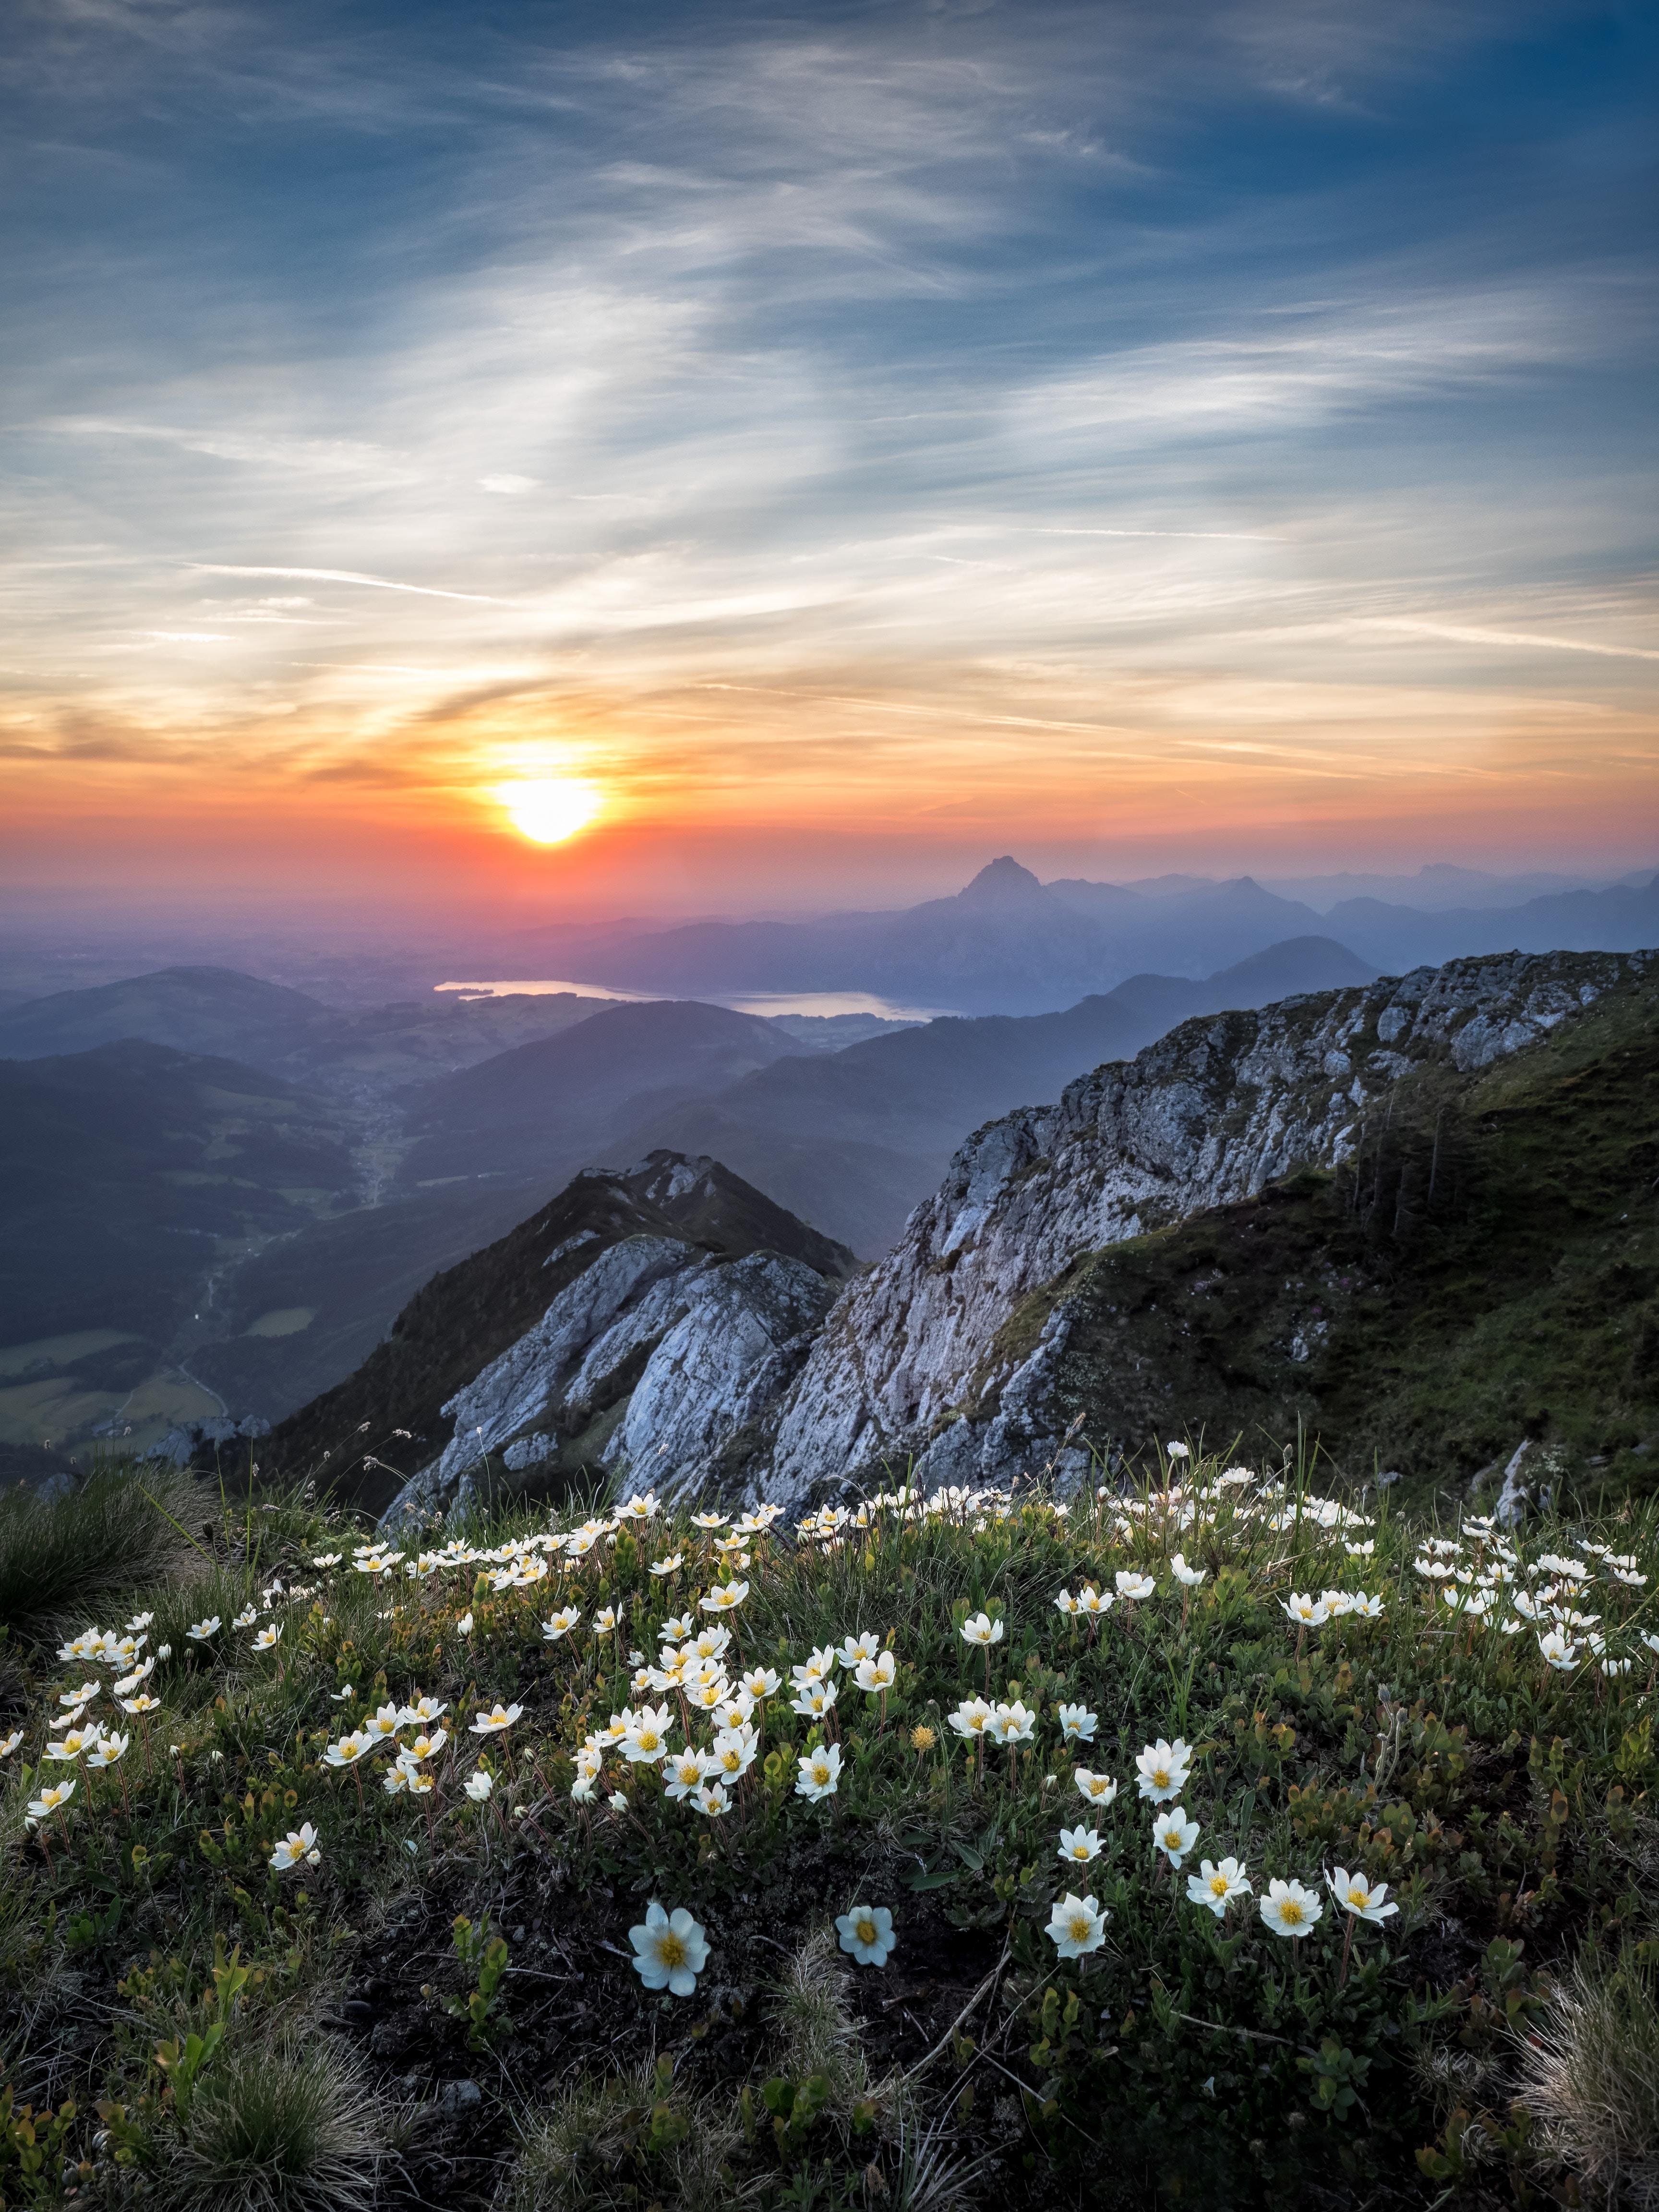 bird's eye view of gray mountain during daytime